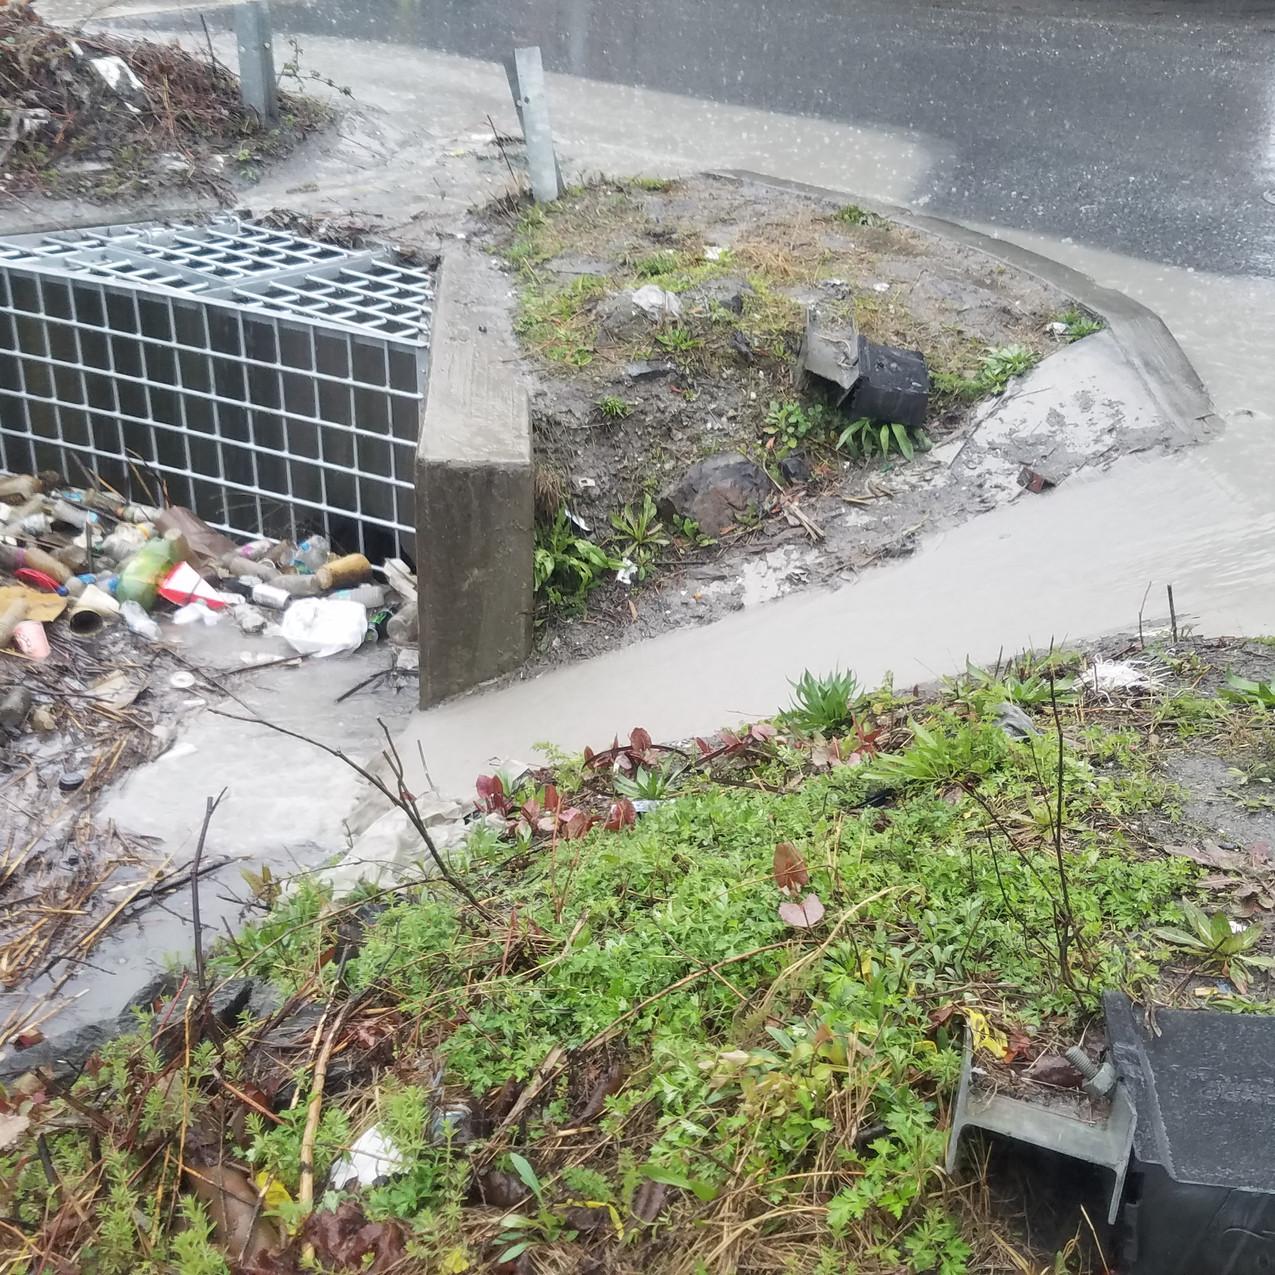 47th Street trash trap